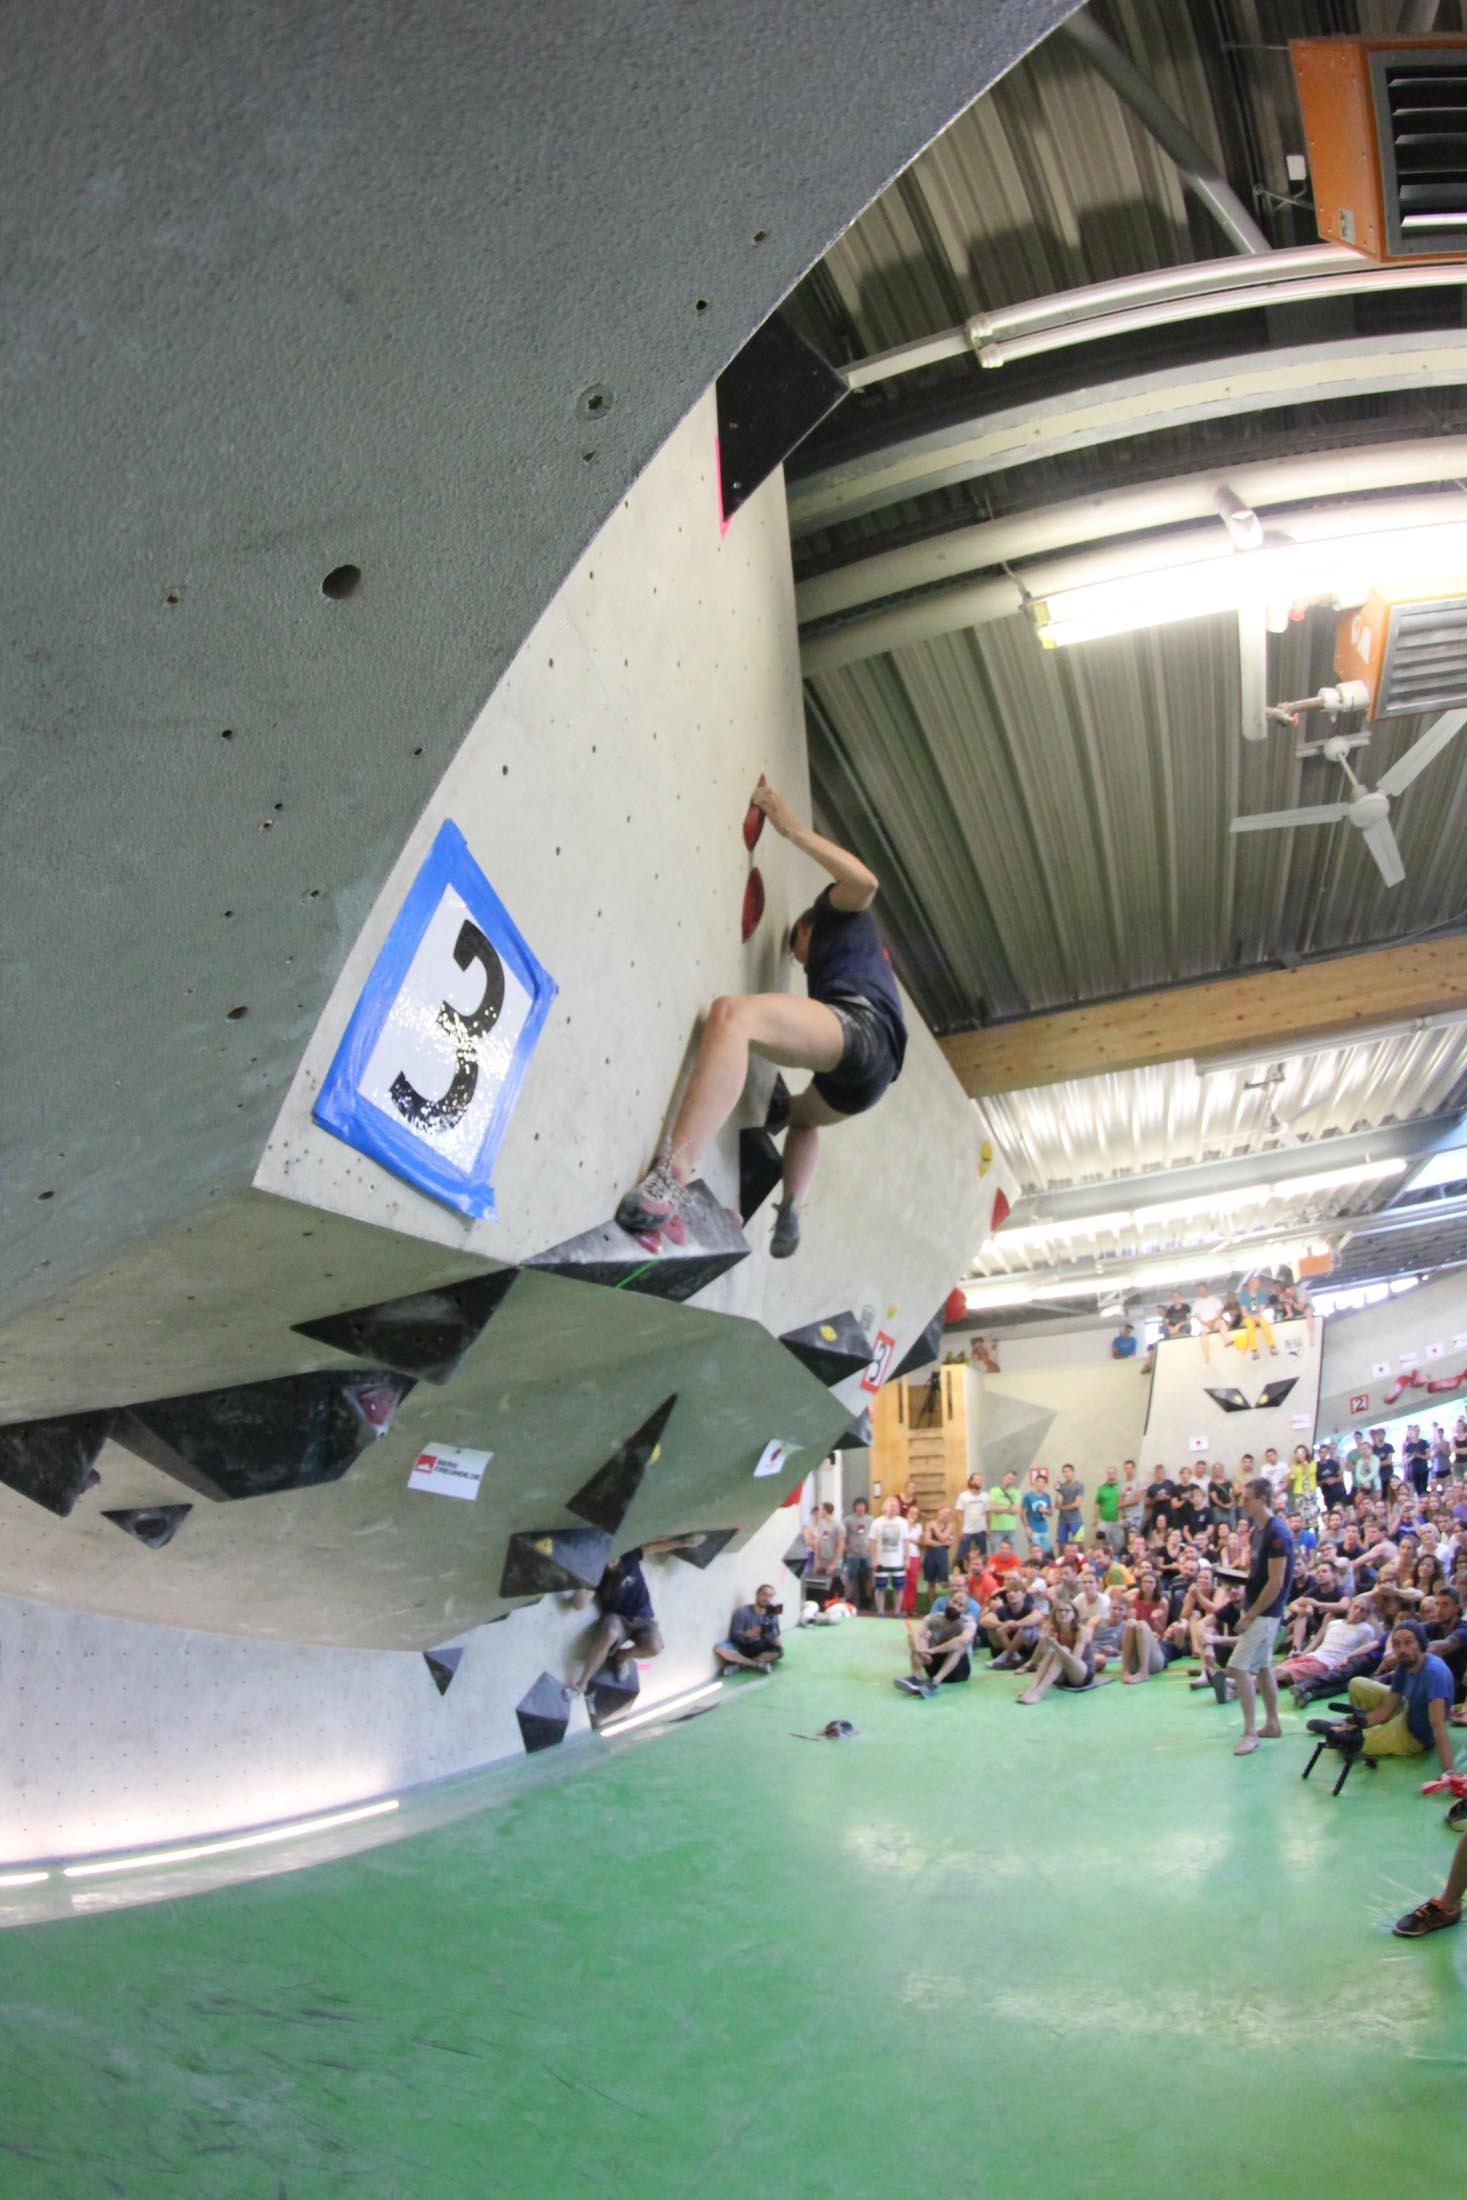 Finale, internationaler bouldercup Frankenjura 2016, BLOCKHELDEN Erlangen, Mammut, Bergfreunde.de, Boulderwettkampf07092016675